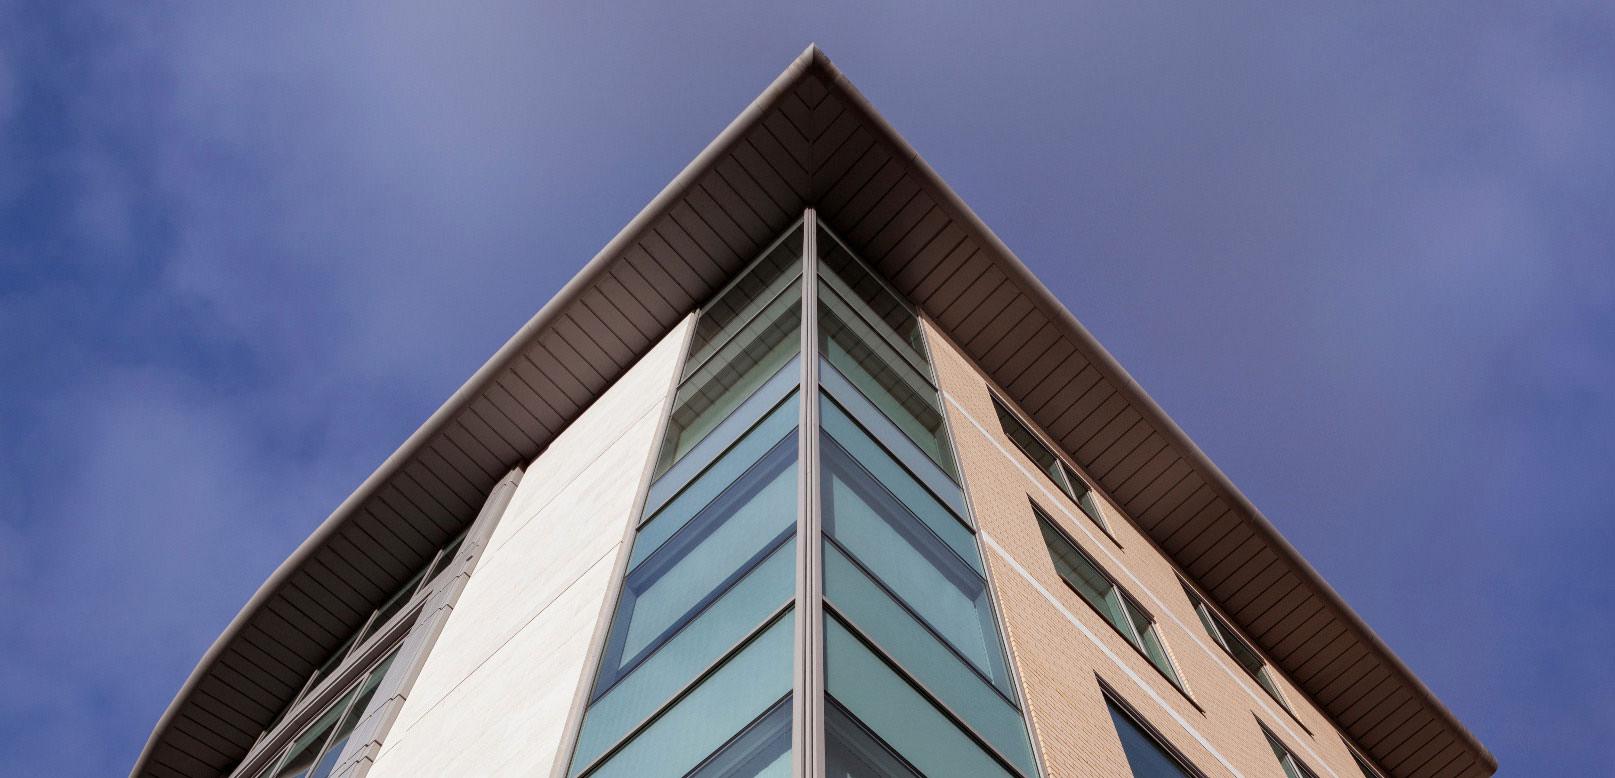 commercial glazing services Milton Keynes